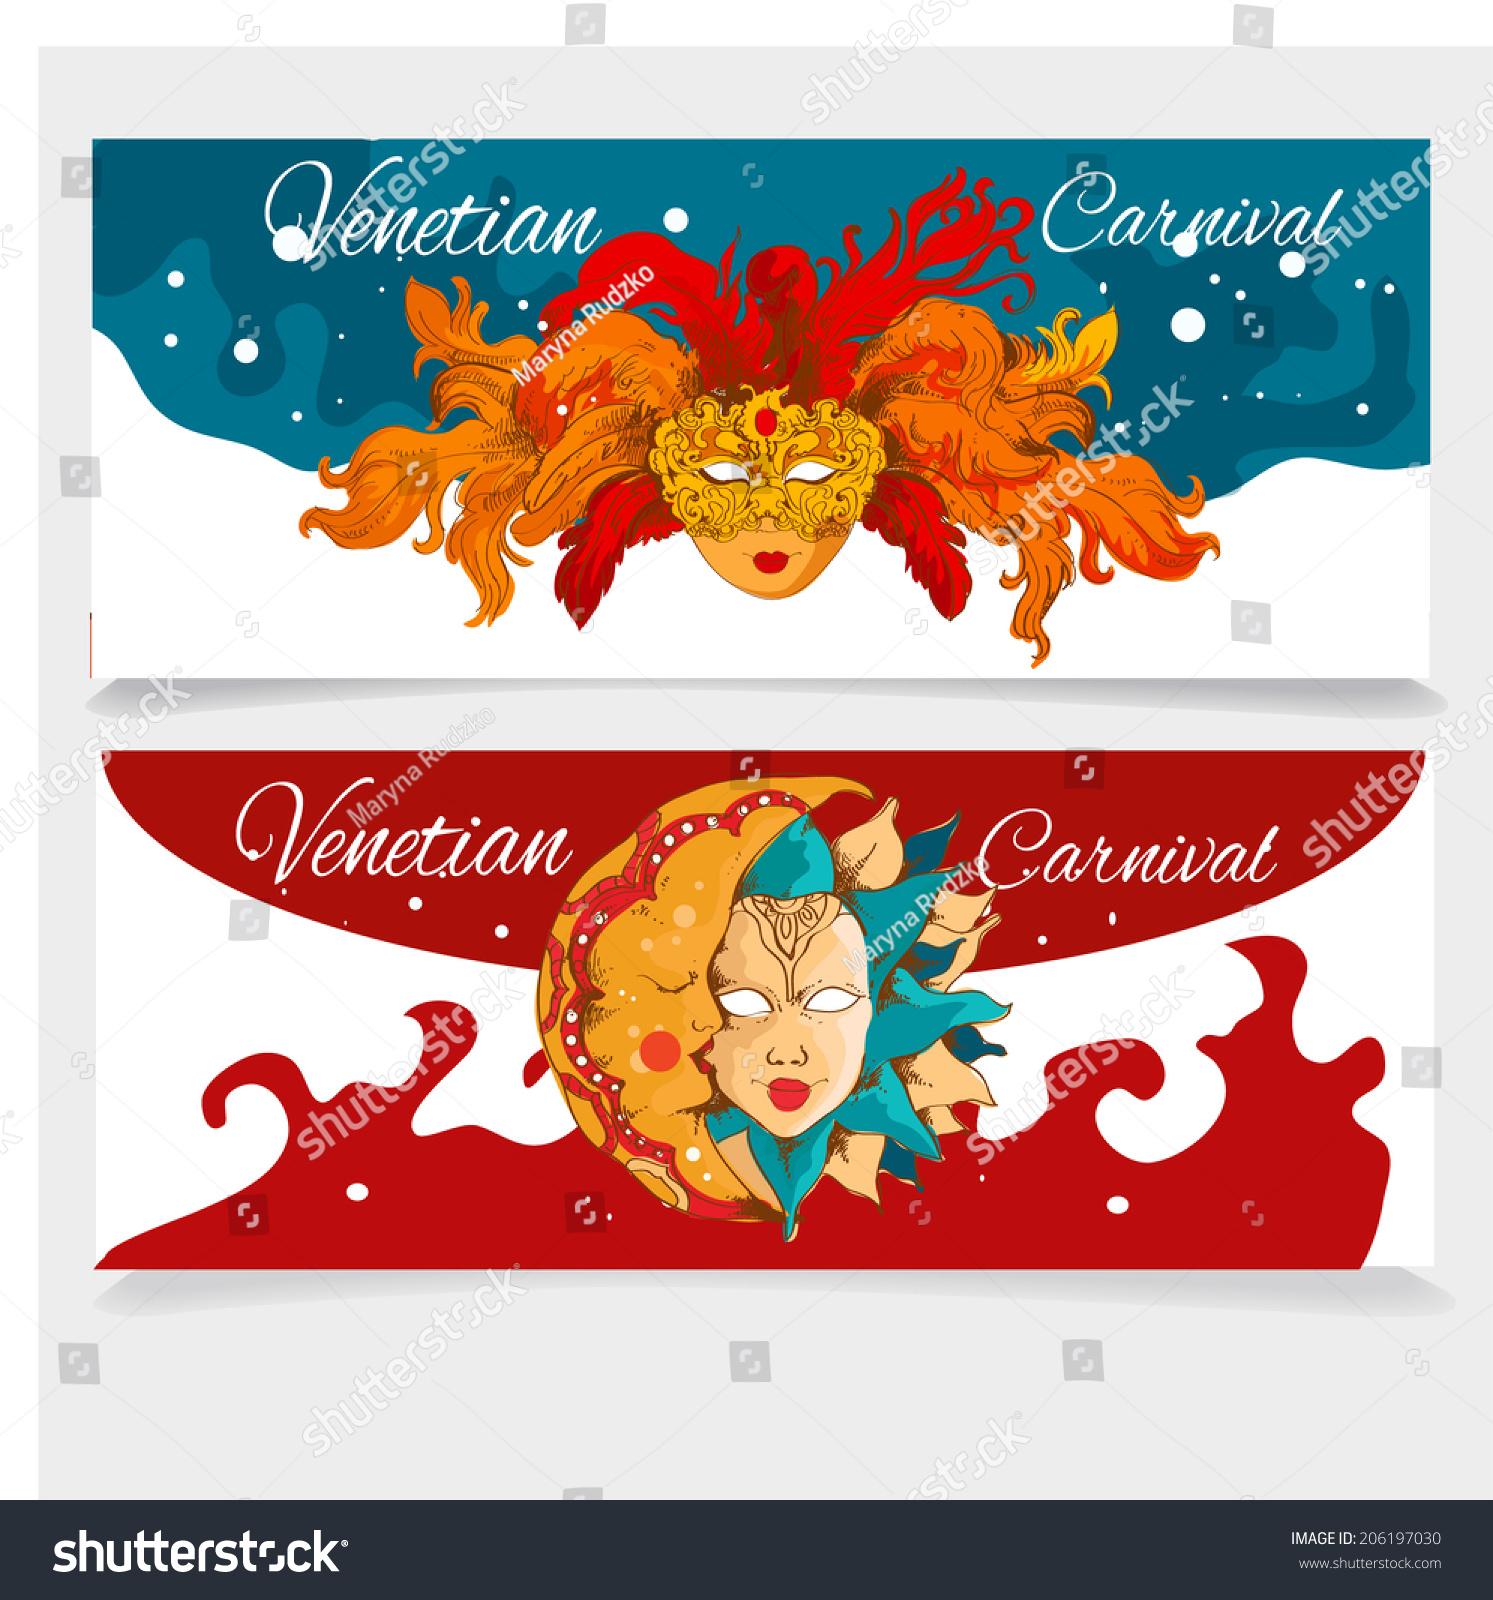 Venetian Mask Vector Decorative Banners Stock Vector (Royalty Free ...